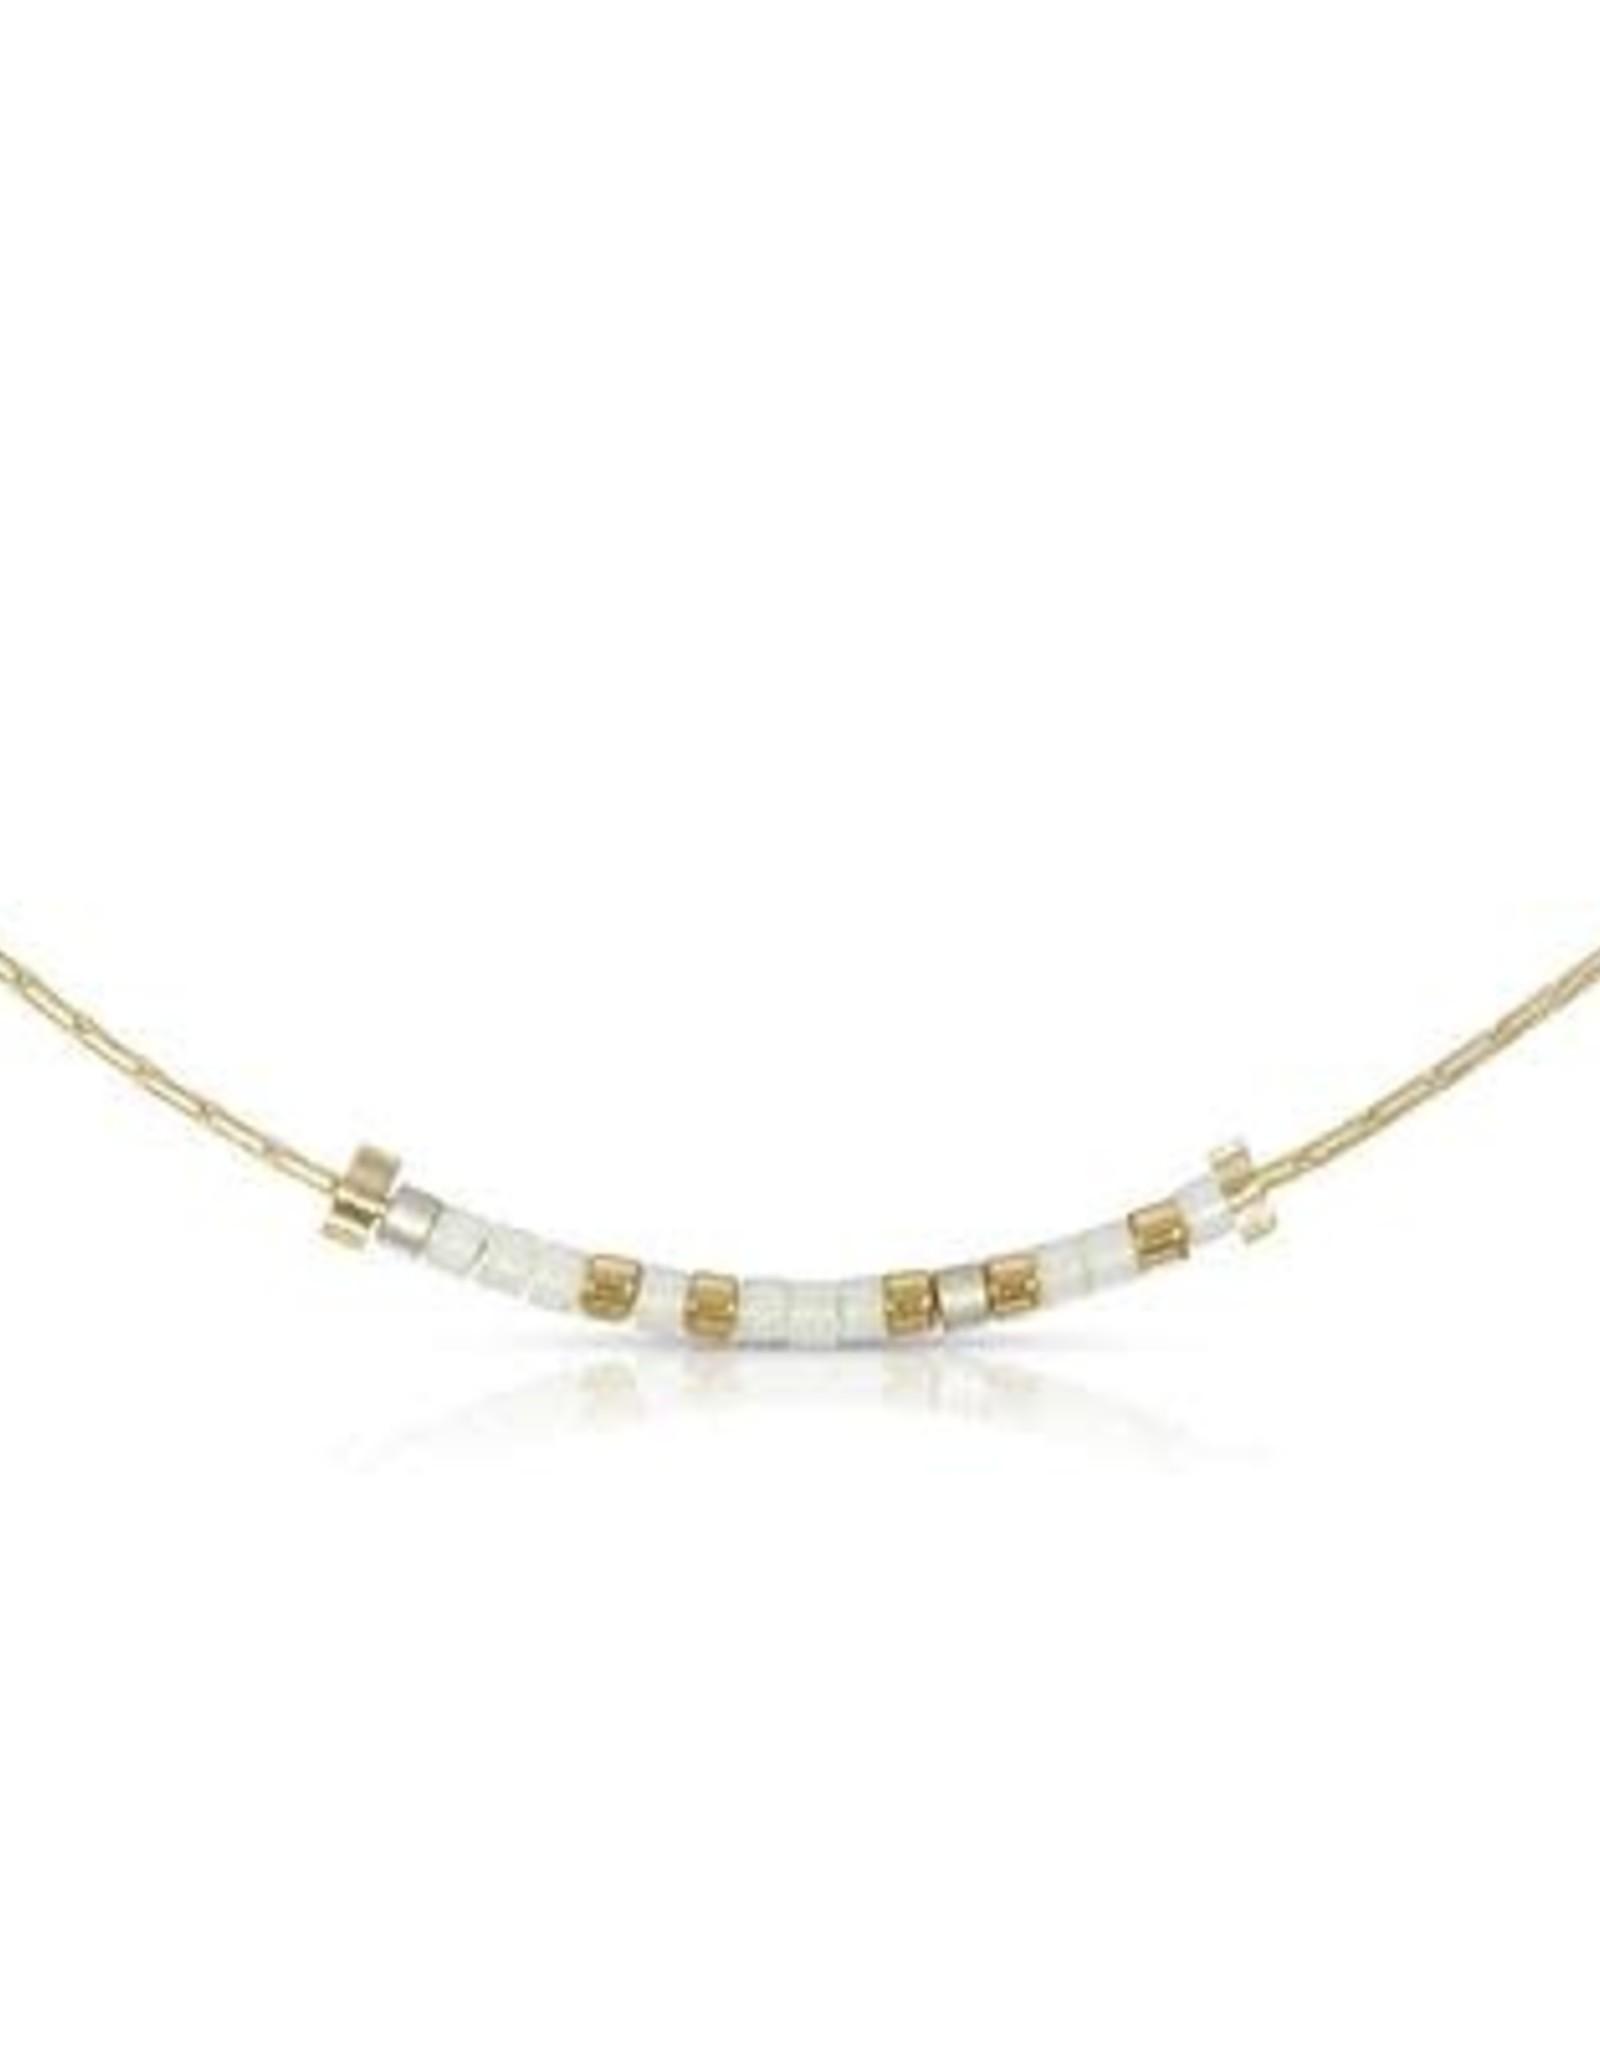 Morse Code Necklace Bestie